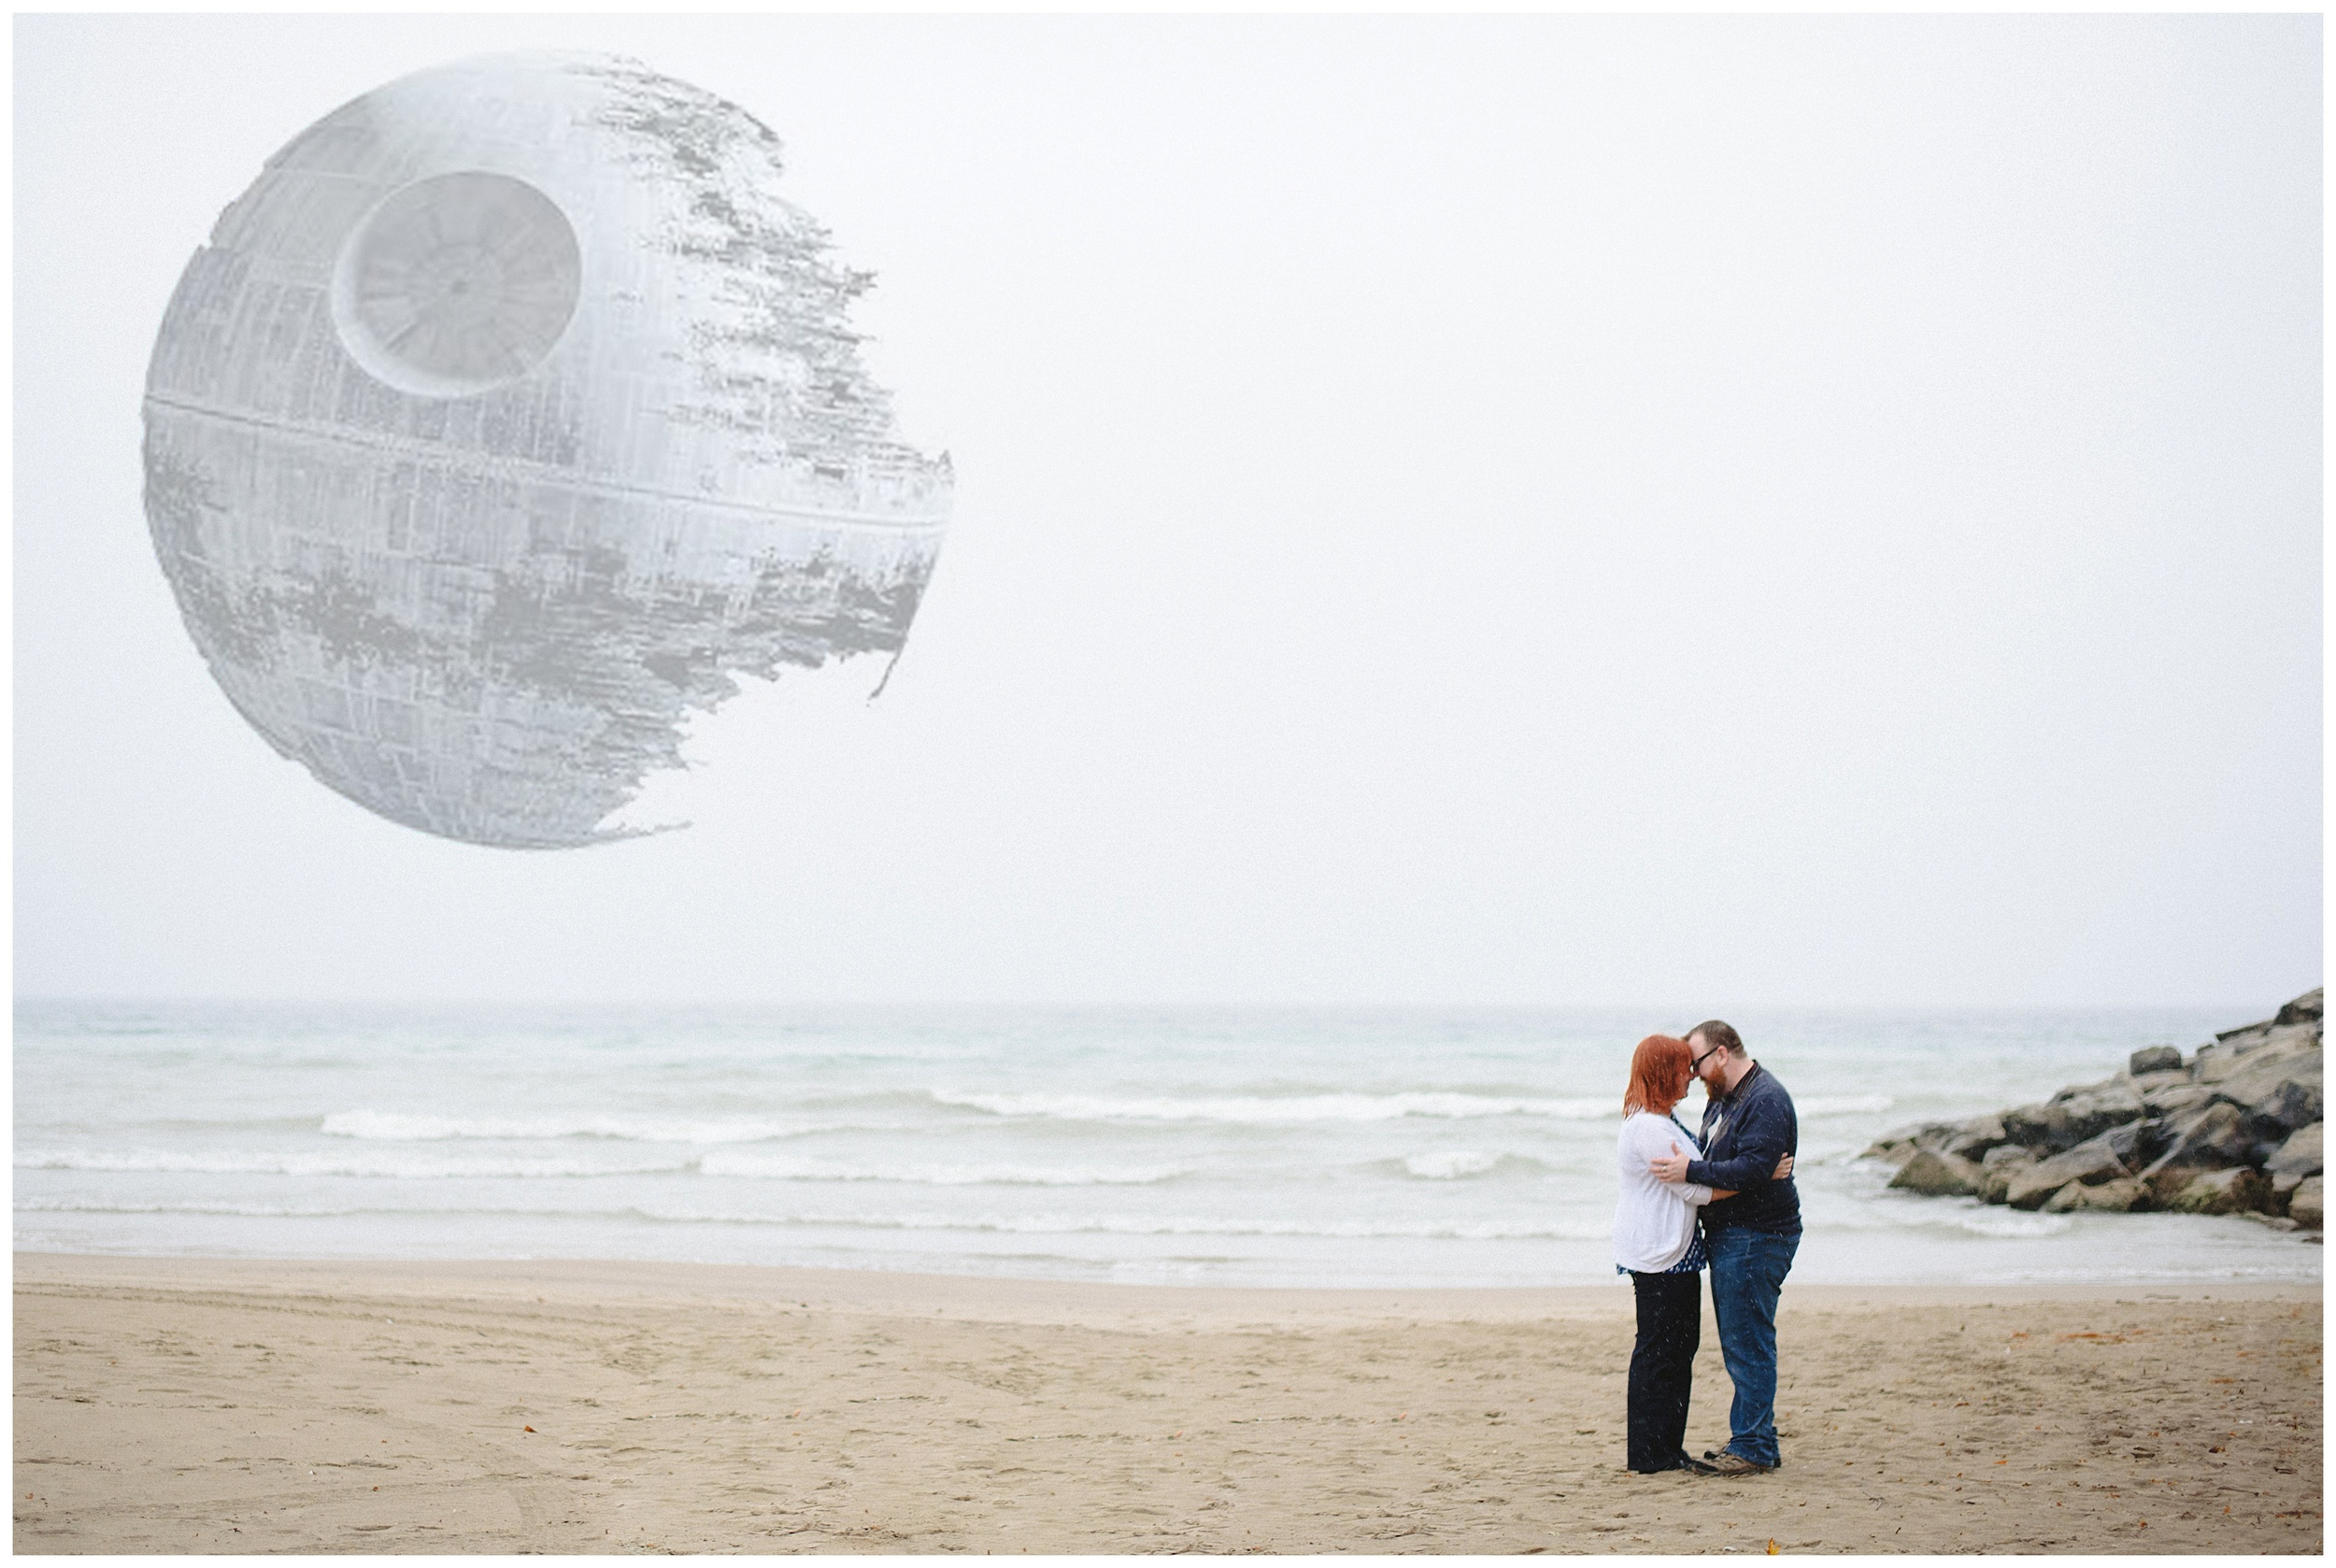 Arynn Photography, Scarborough Bluffs engagement shoot, Toronto Weddding Photographer, Durham Wedding Photographer, Geeky Engagement, Star wars, Death Star, Beach engagement